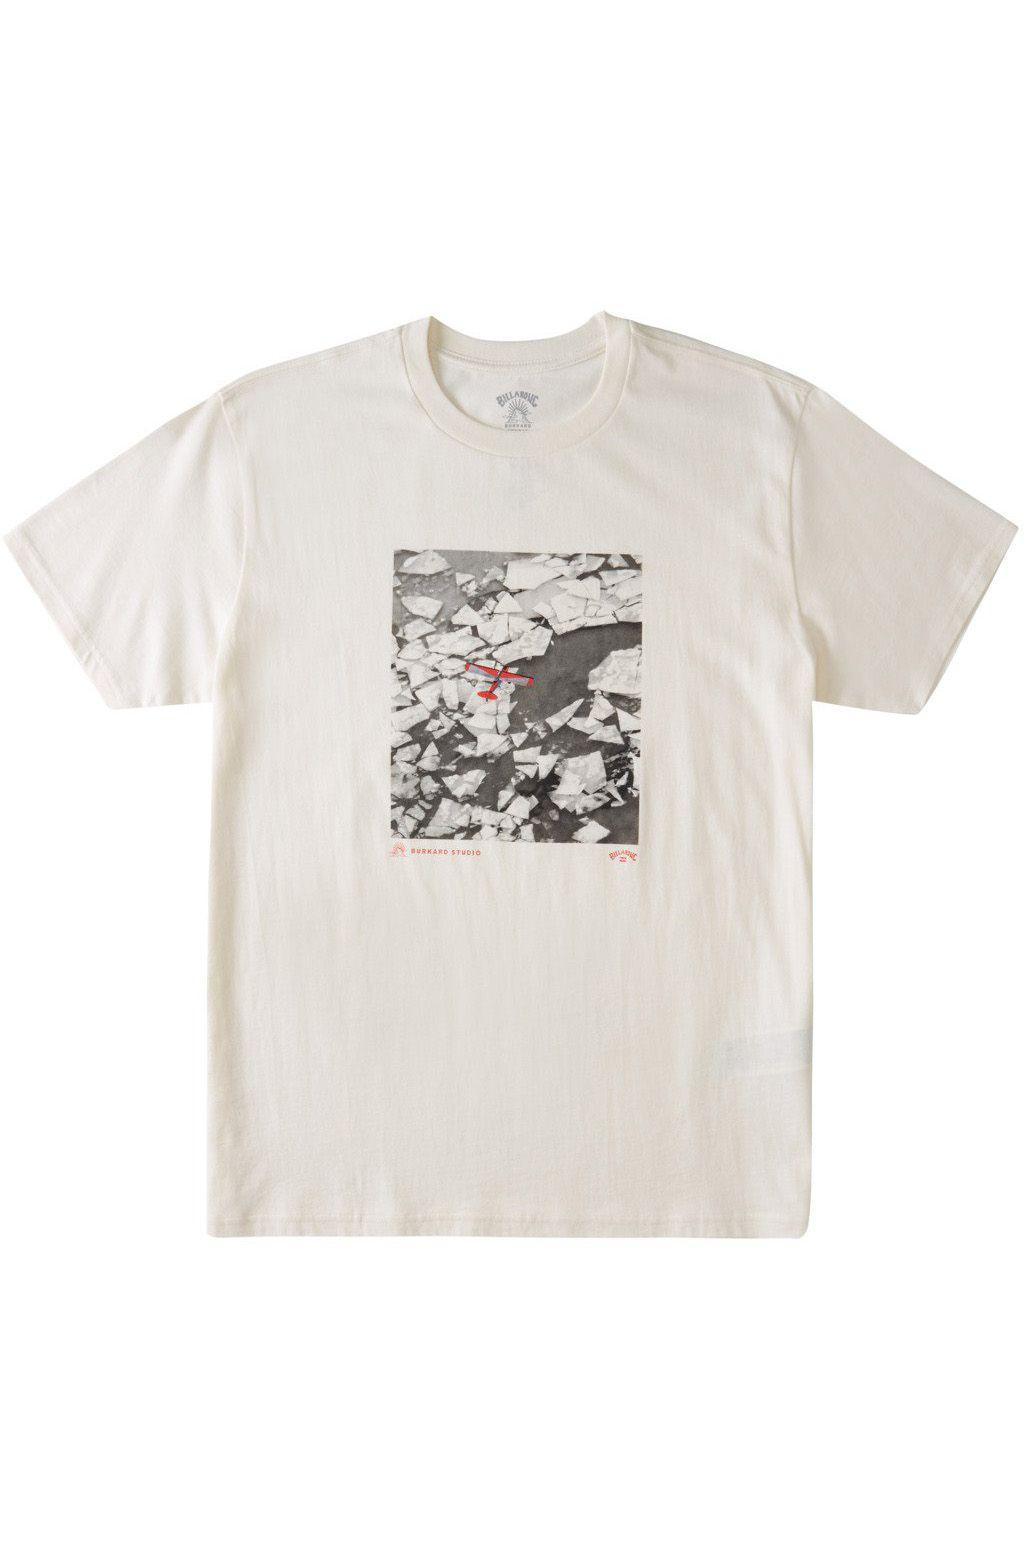 T-Shirt Billabong ICEBURG AERIAL SS ADIV / CHRIS BURKARD Snow